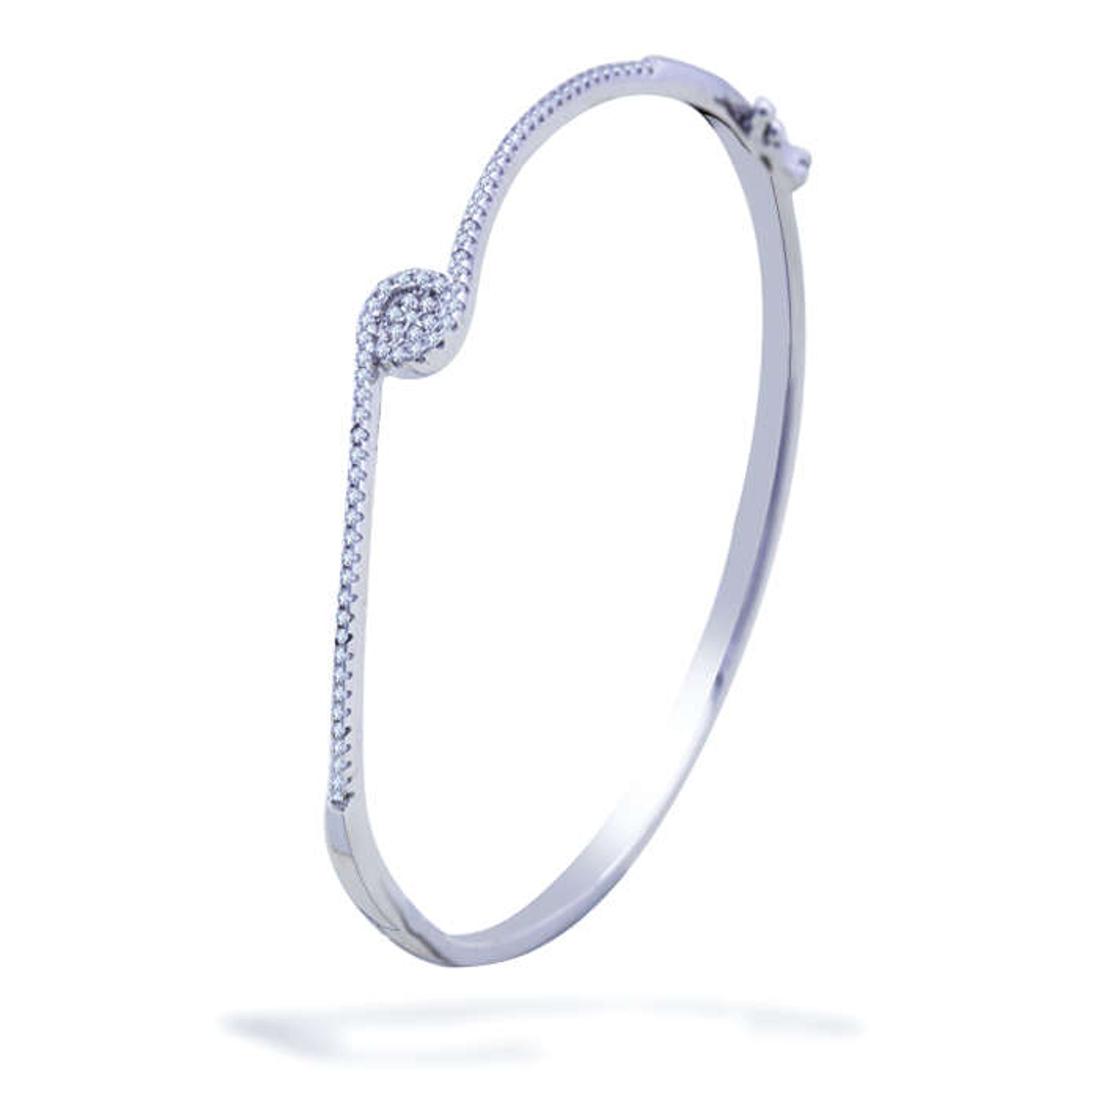 Silver Shine 92.5 Sterling SilverUnique  Diamond Bracelet for Women & Girls